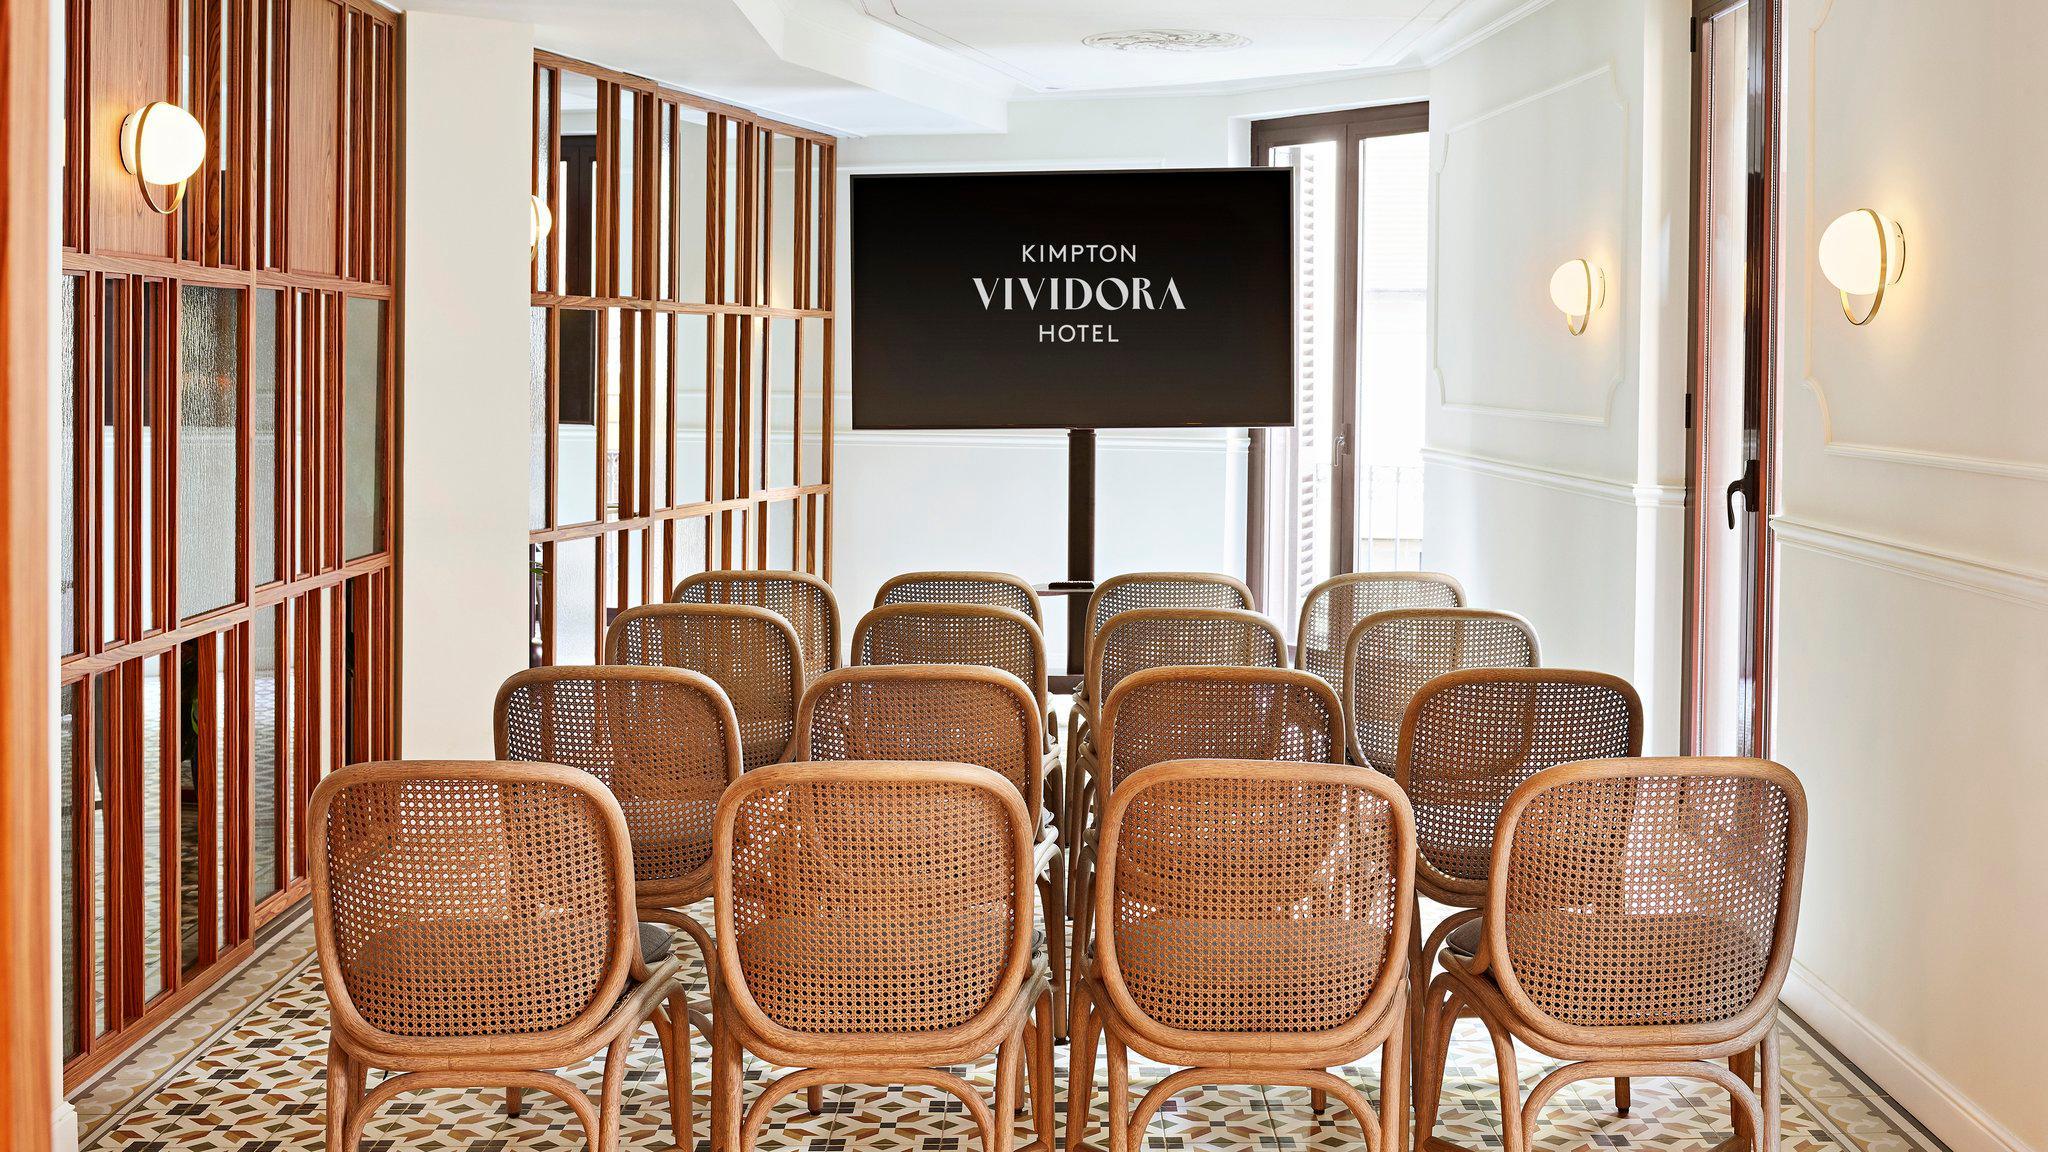 Kimpton Vividora Hotel